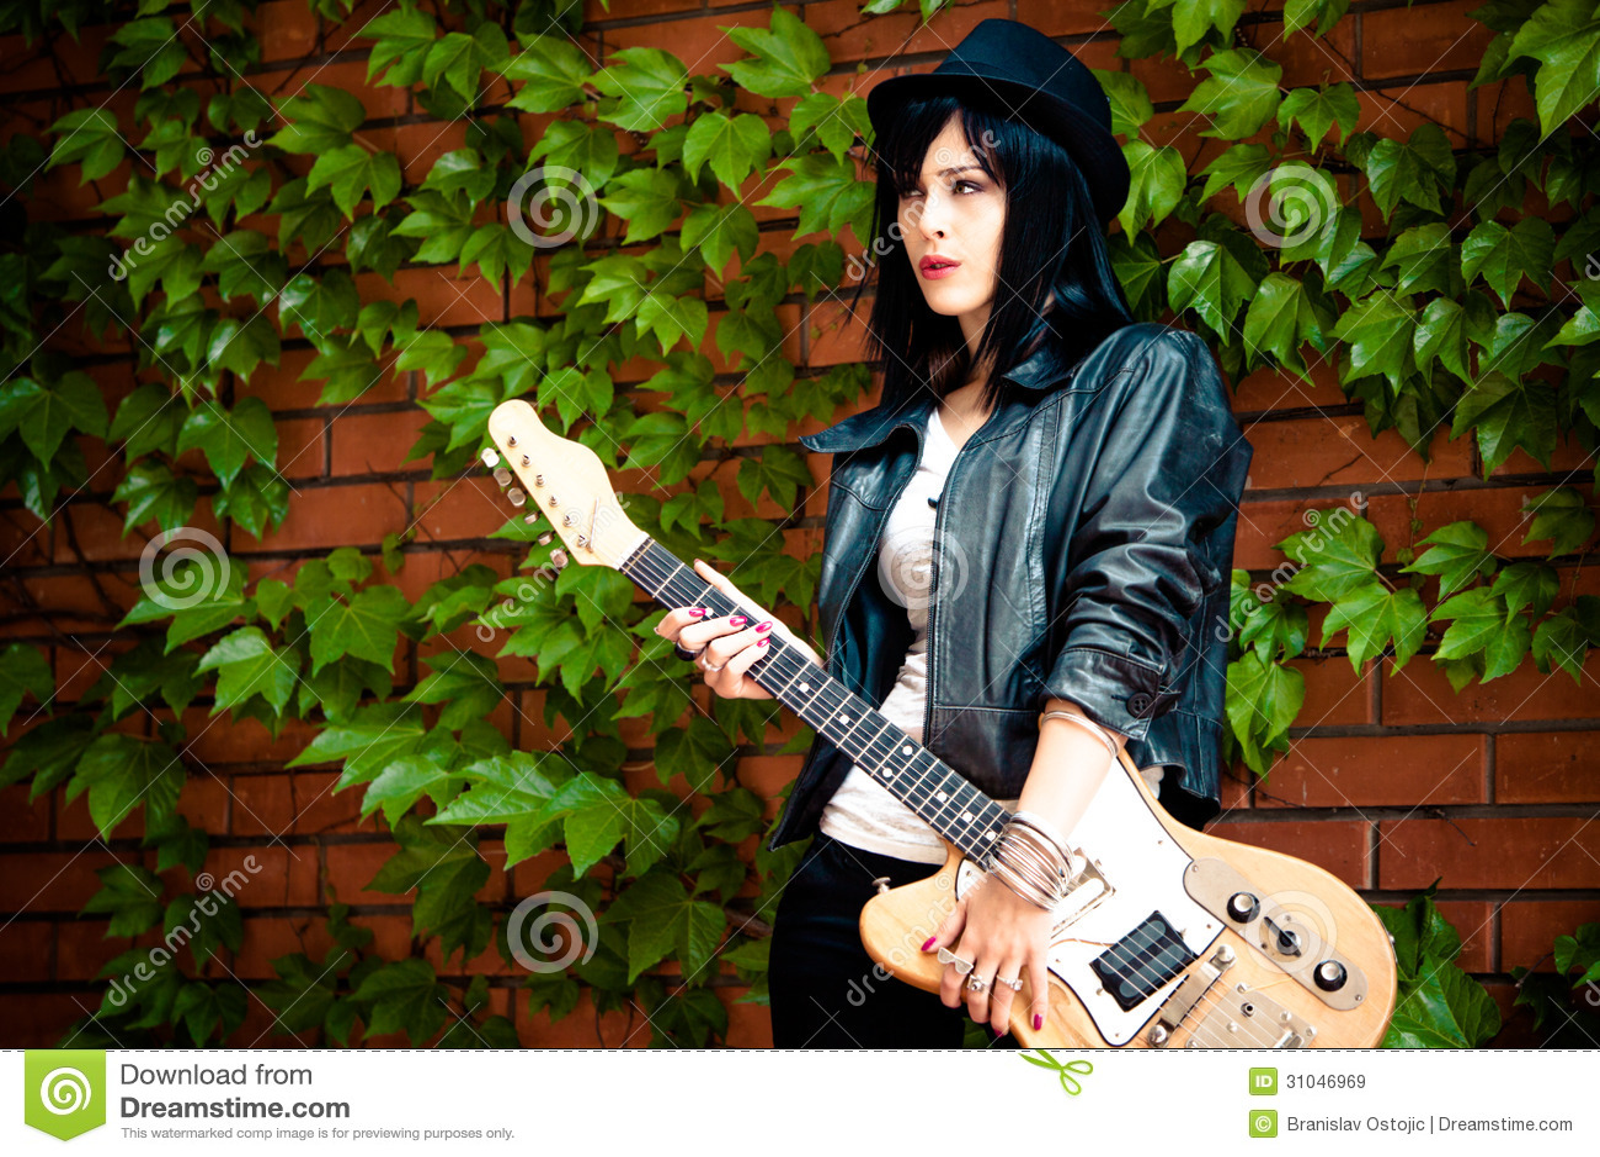 Rock Girl Stock Image Image Of Stand Plant Orange 31046969